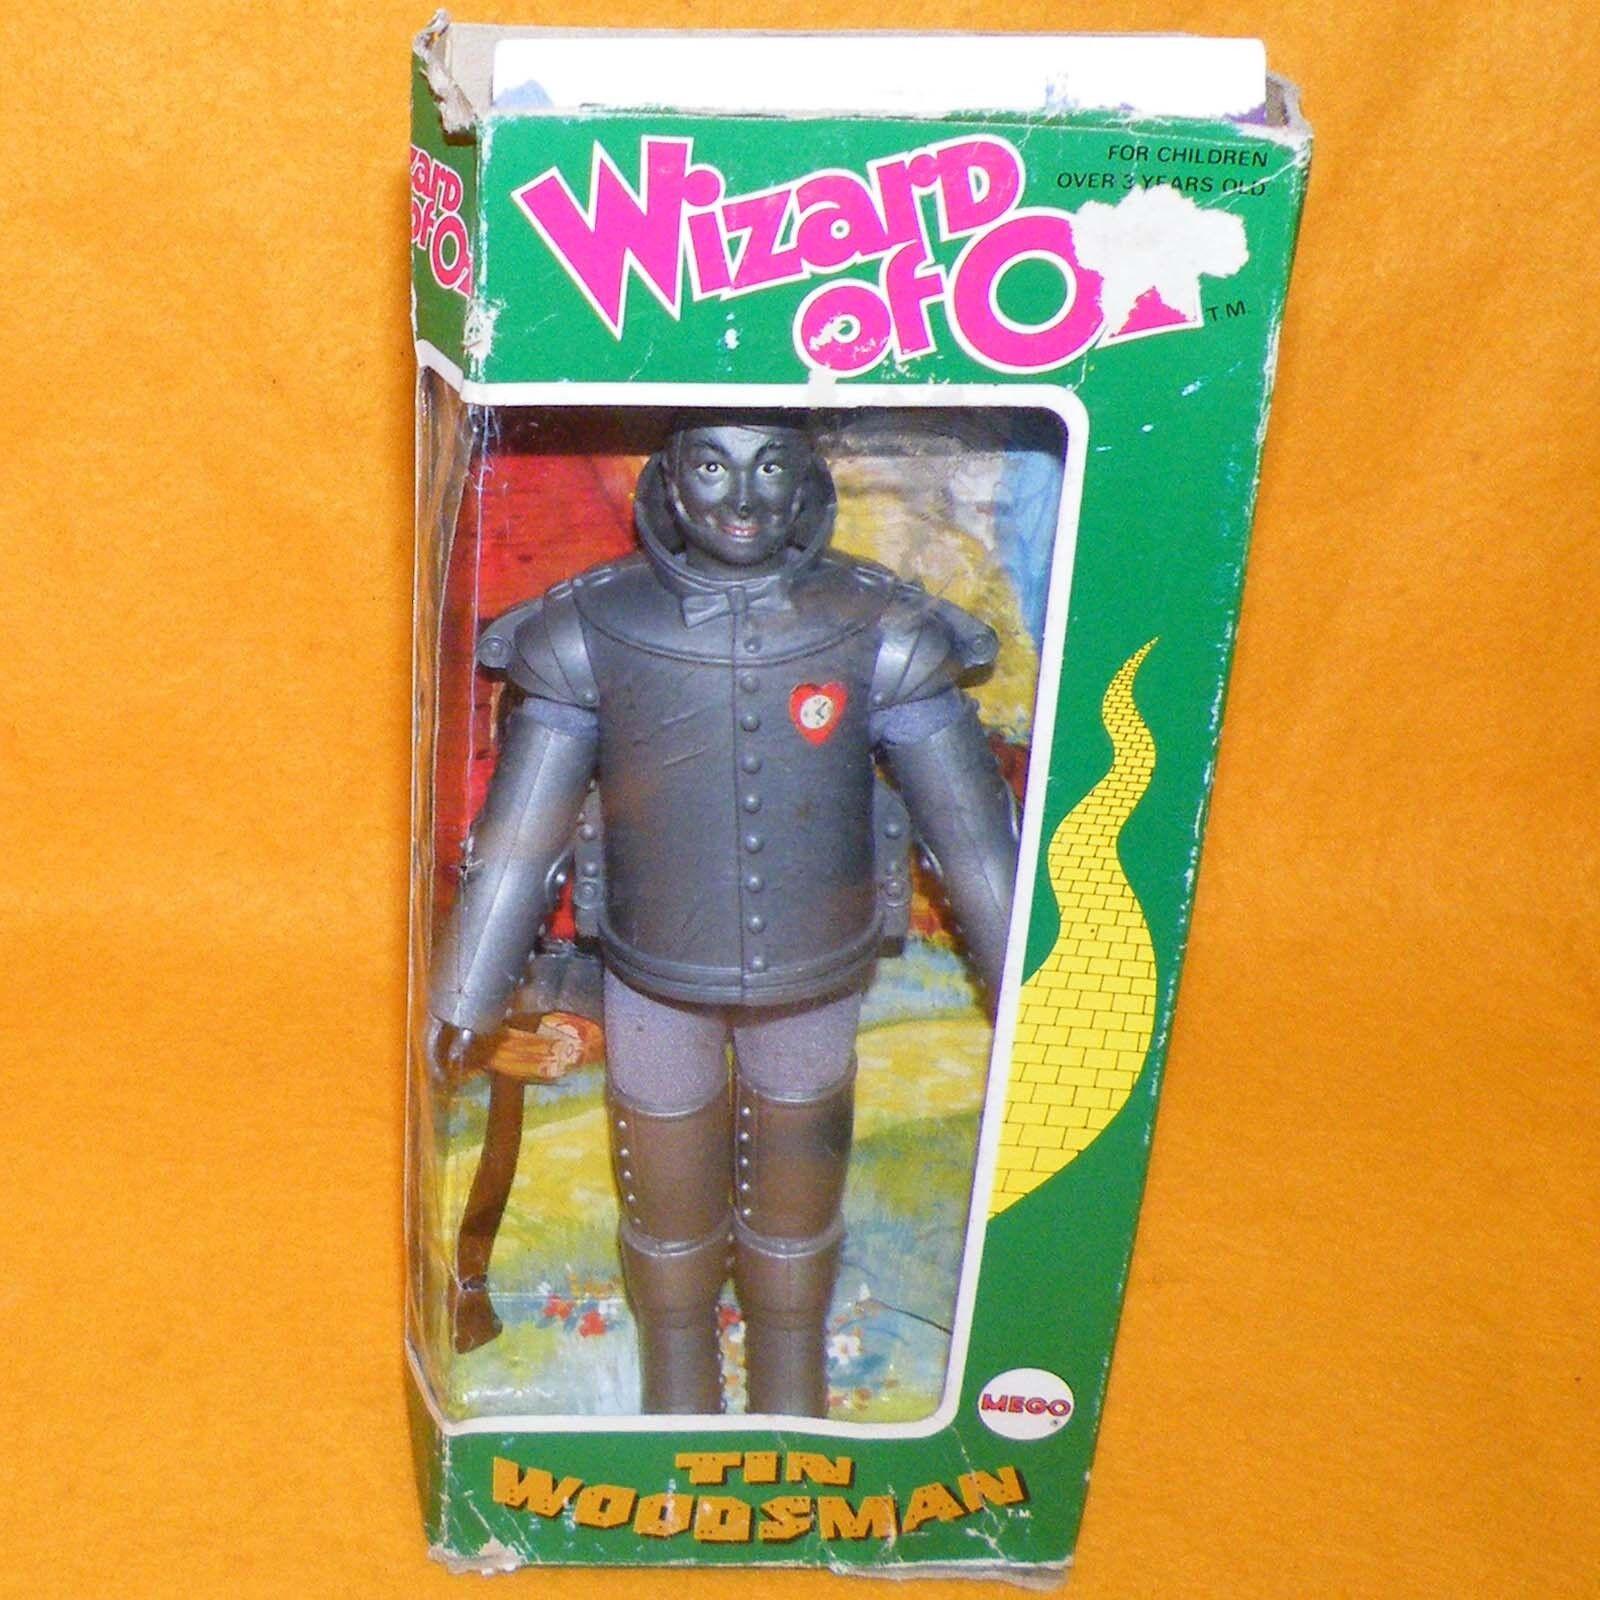 VINTAGE 1974 70s MEGO WIZARD OF OZ TIN WOODSMAN MAN 8  DOLL FIGURE BOXED RARE